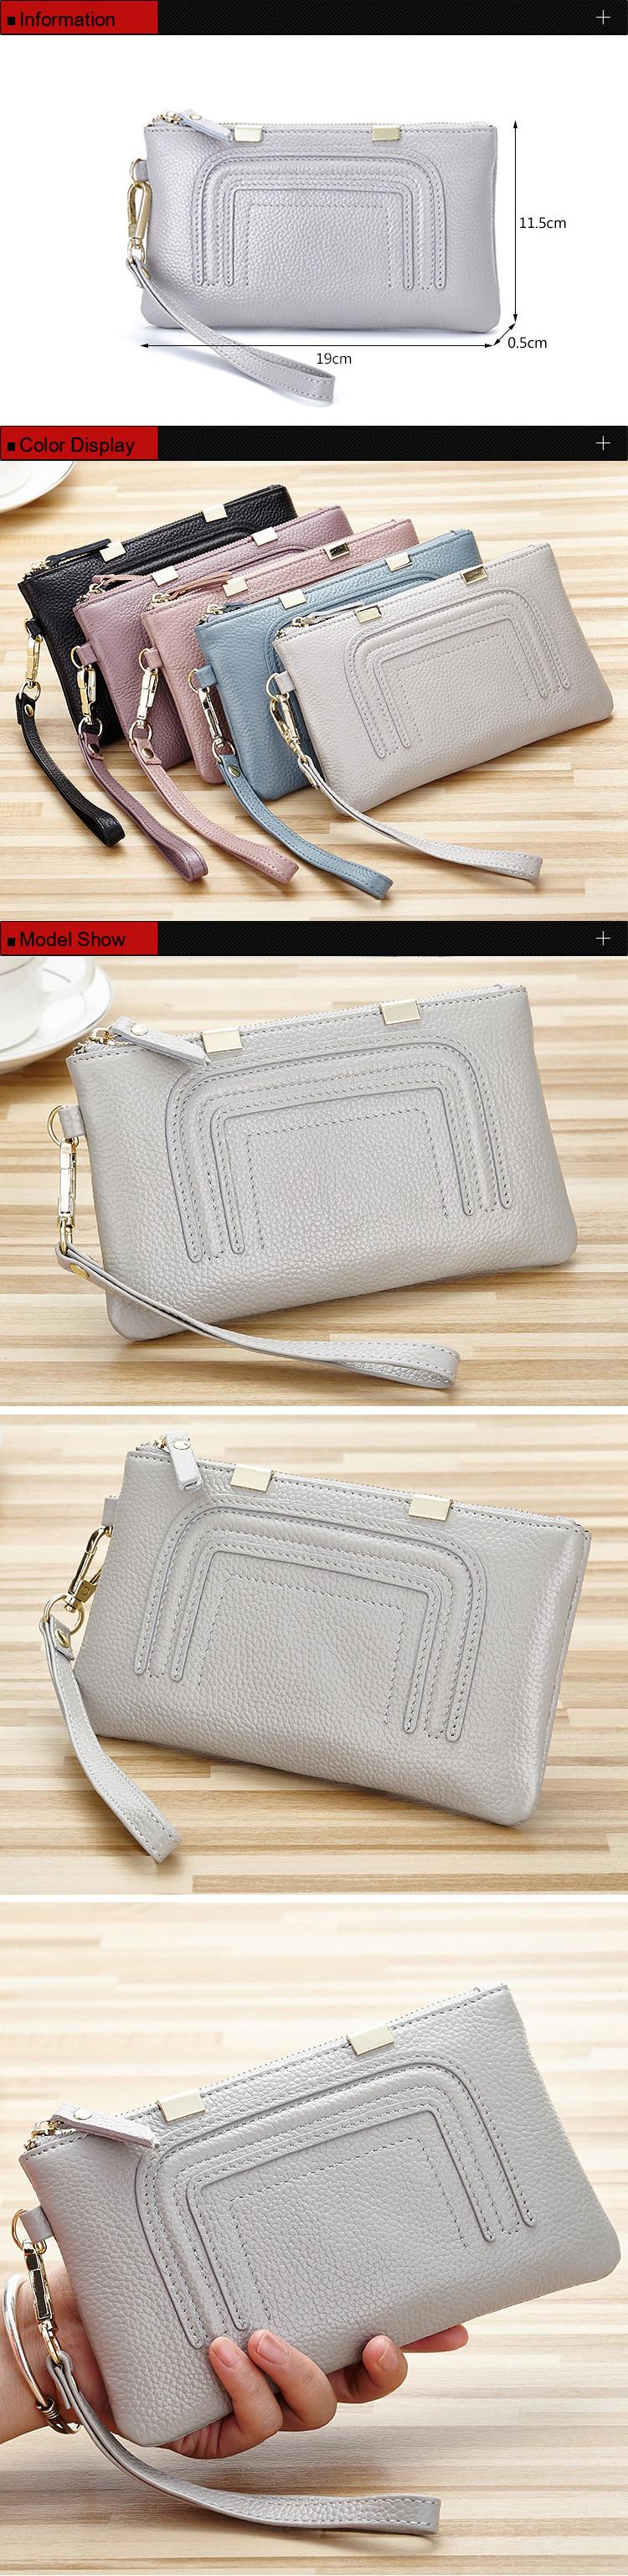 woman-handbag1